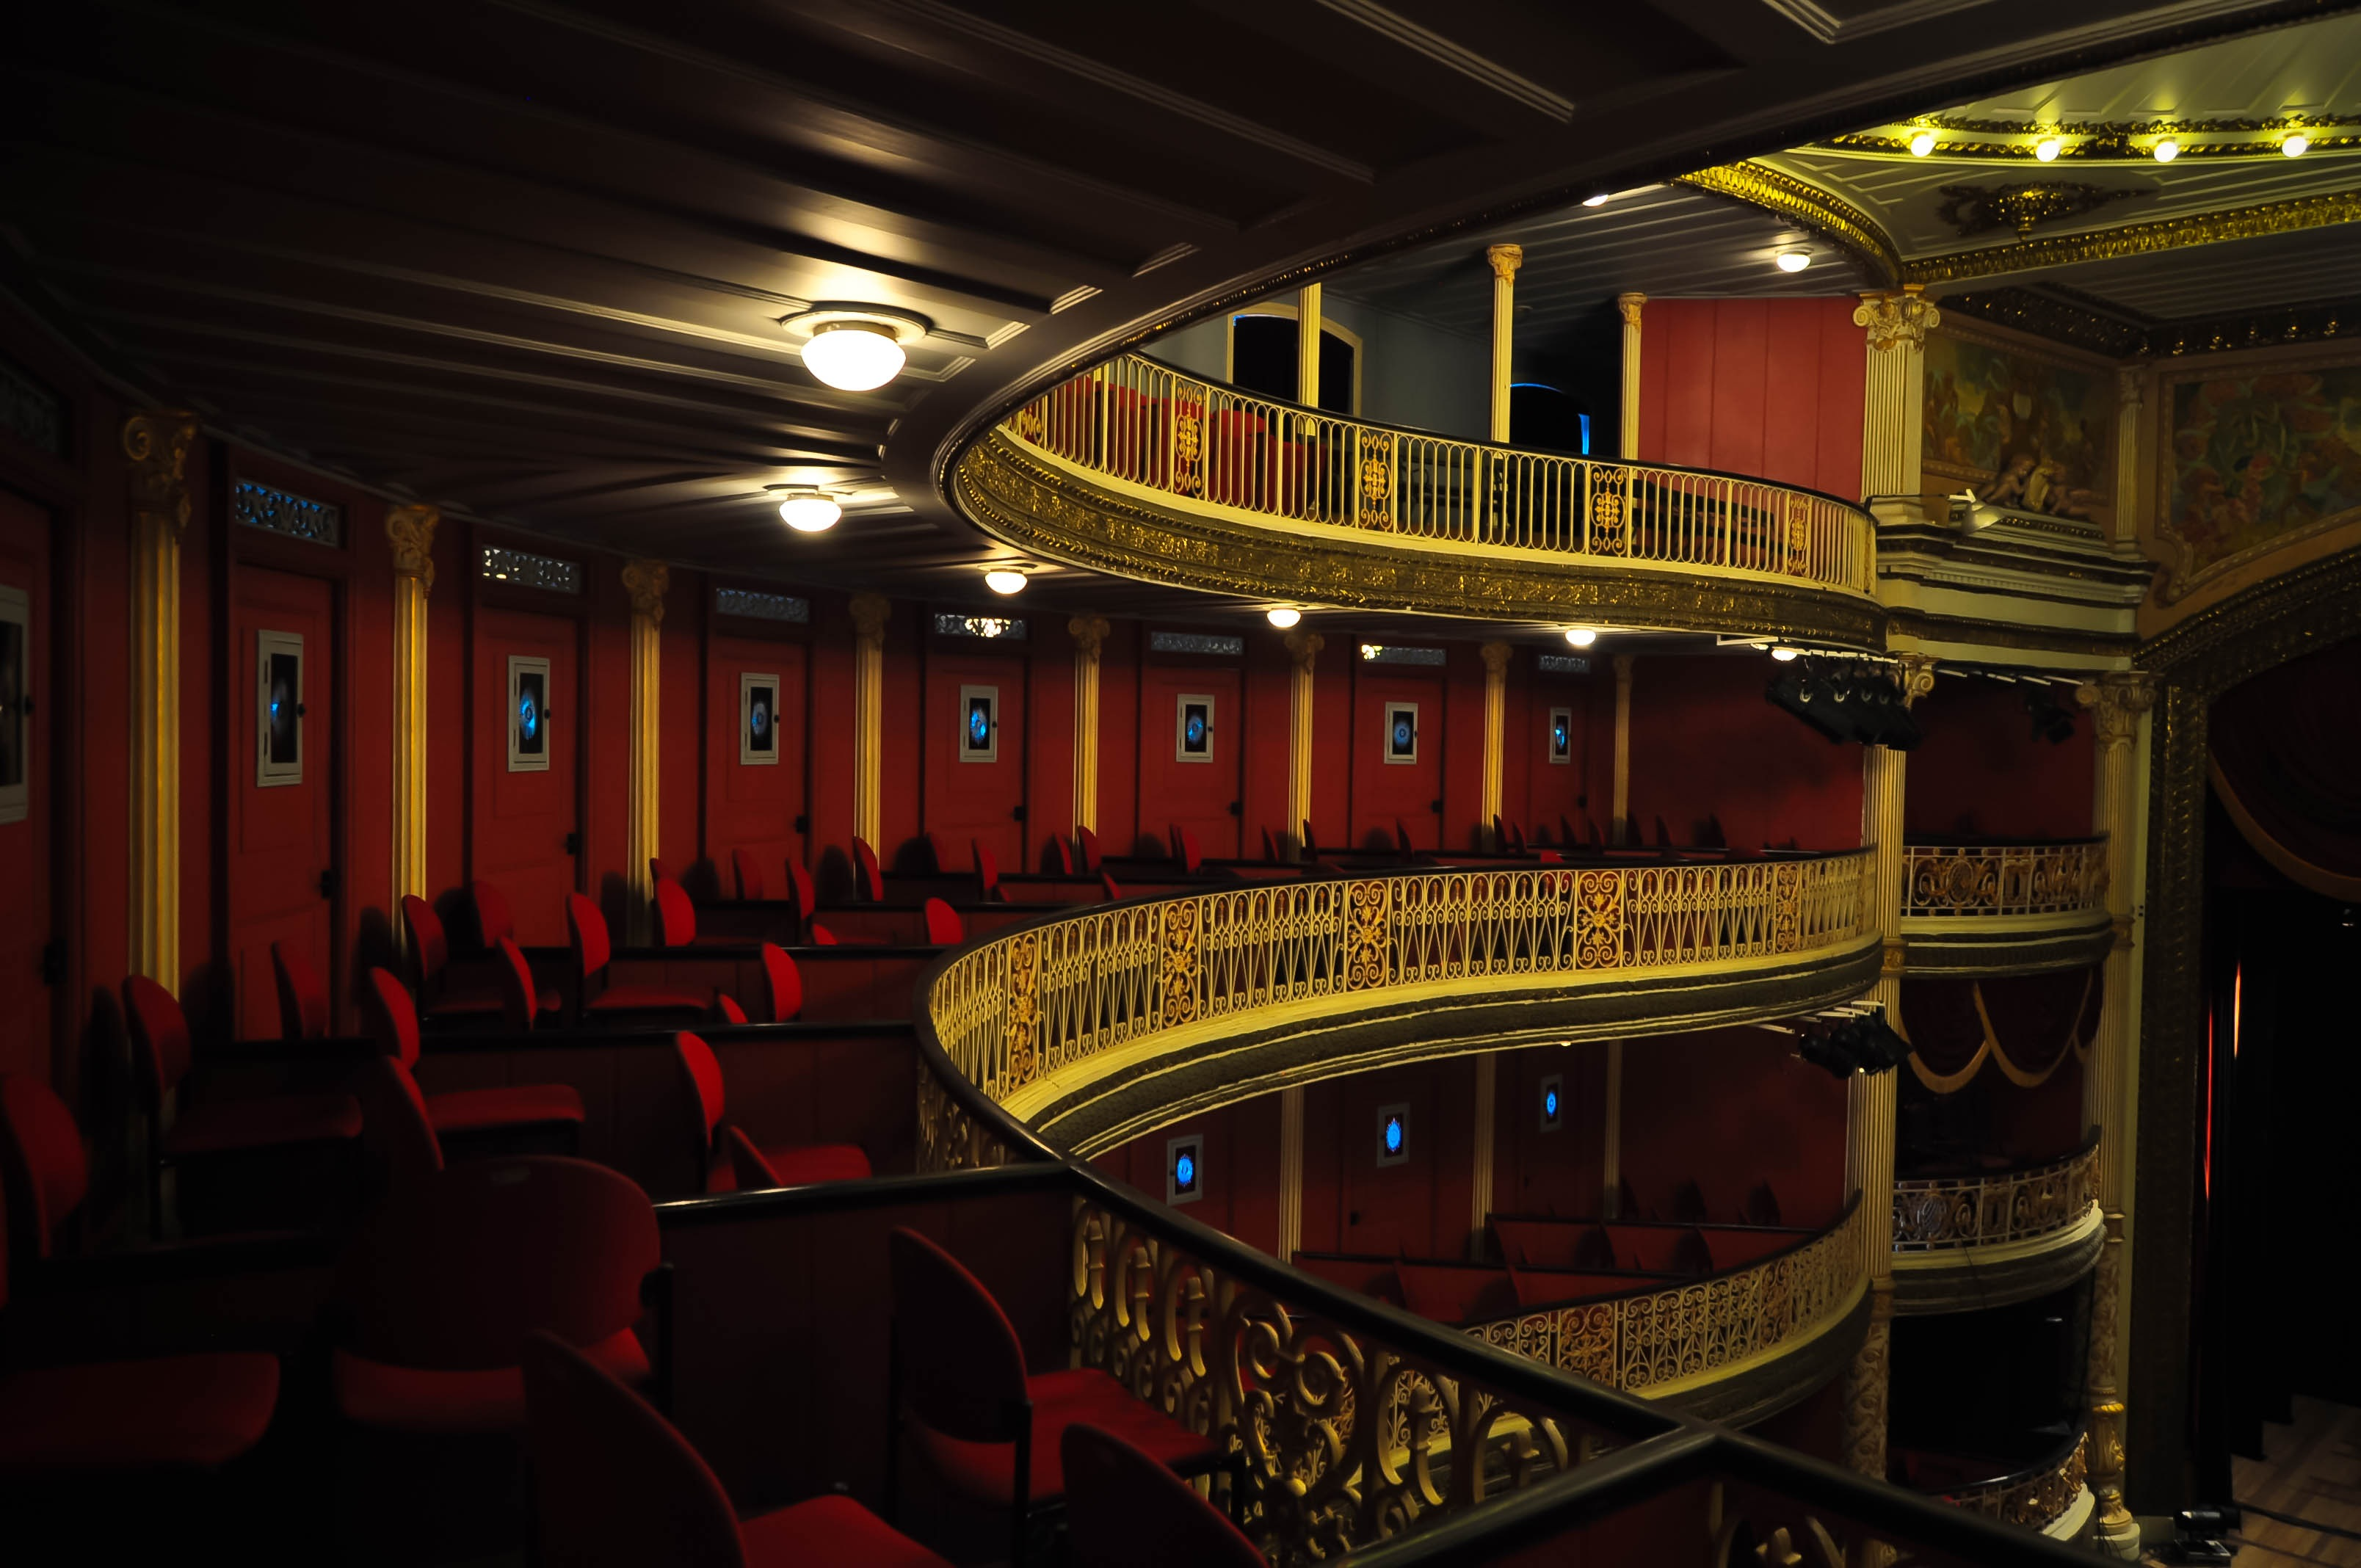 Interior_do_Teatro_de_Santa_Isabel,_Recife,_Pernambuco,_Brasil